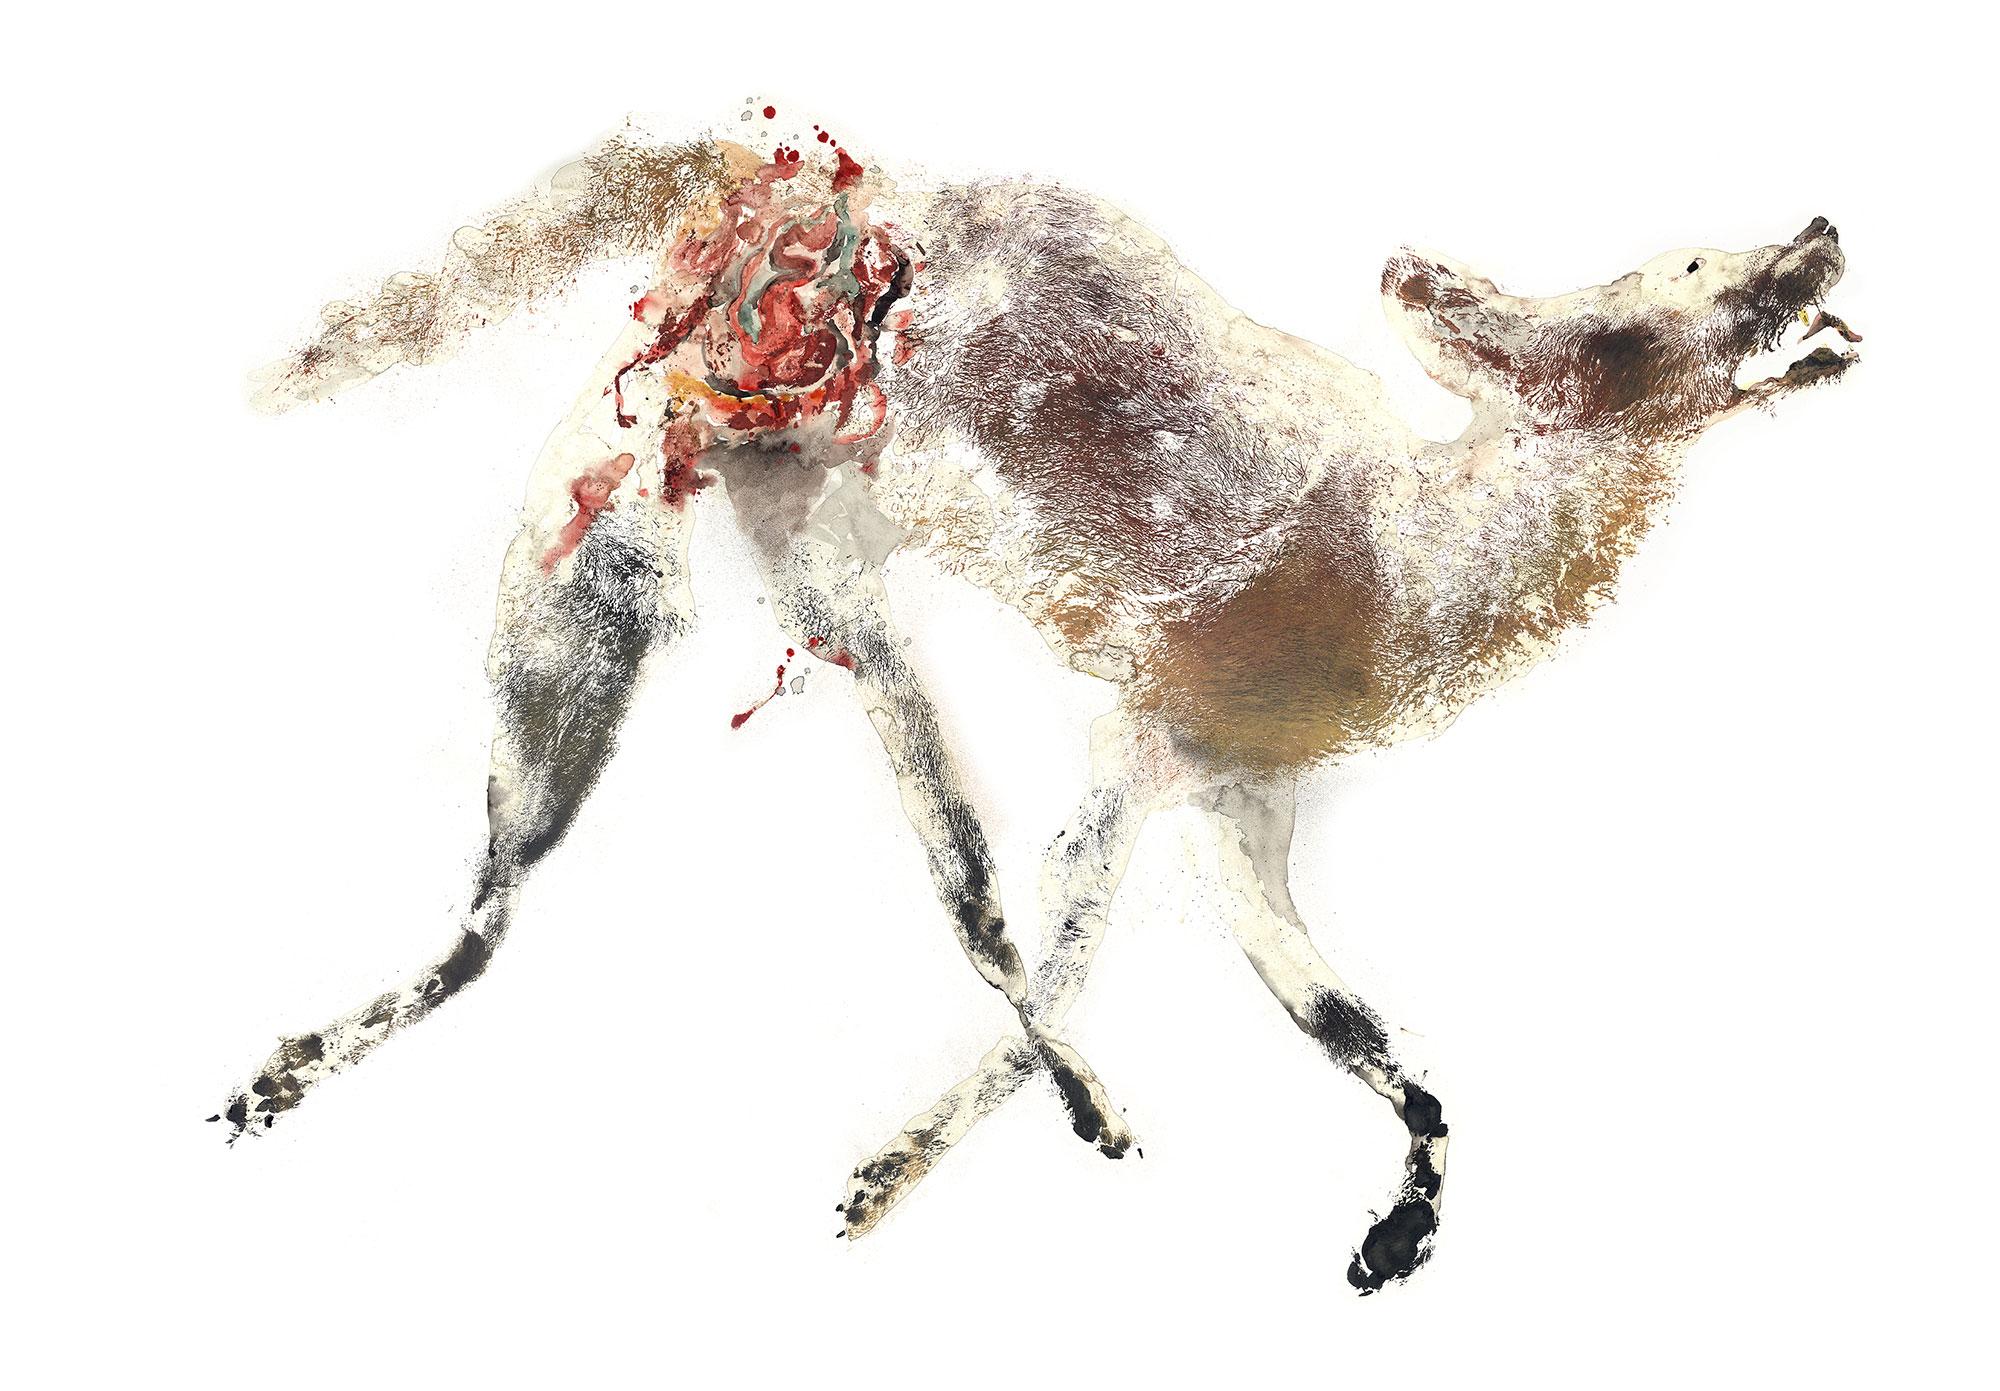 Coyote Canis latrans